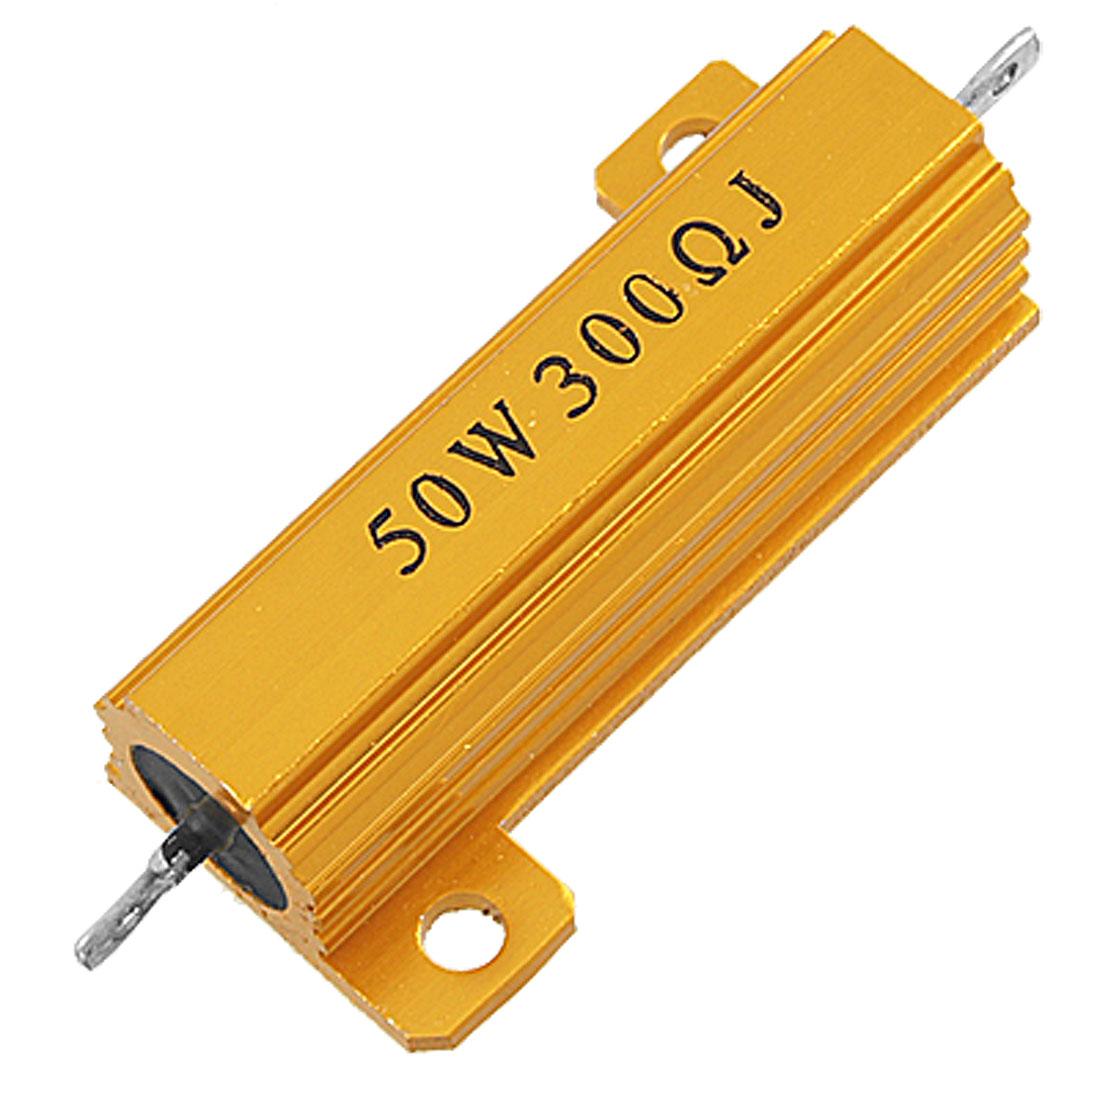 50W 300 Ohms 5% Screw Tab Aluminium Clad Wirewound Resistor Gold Tone